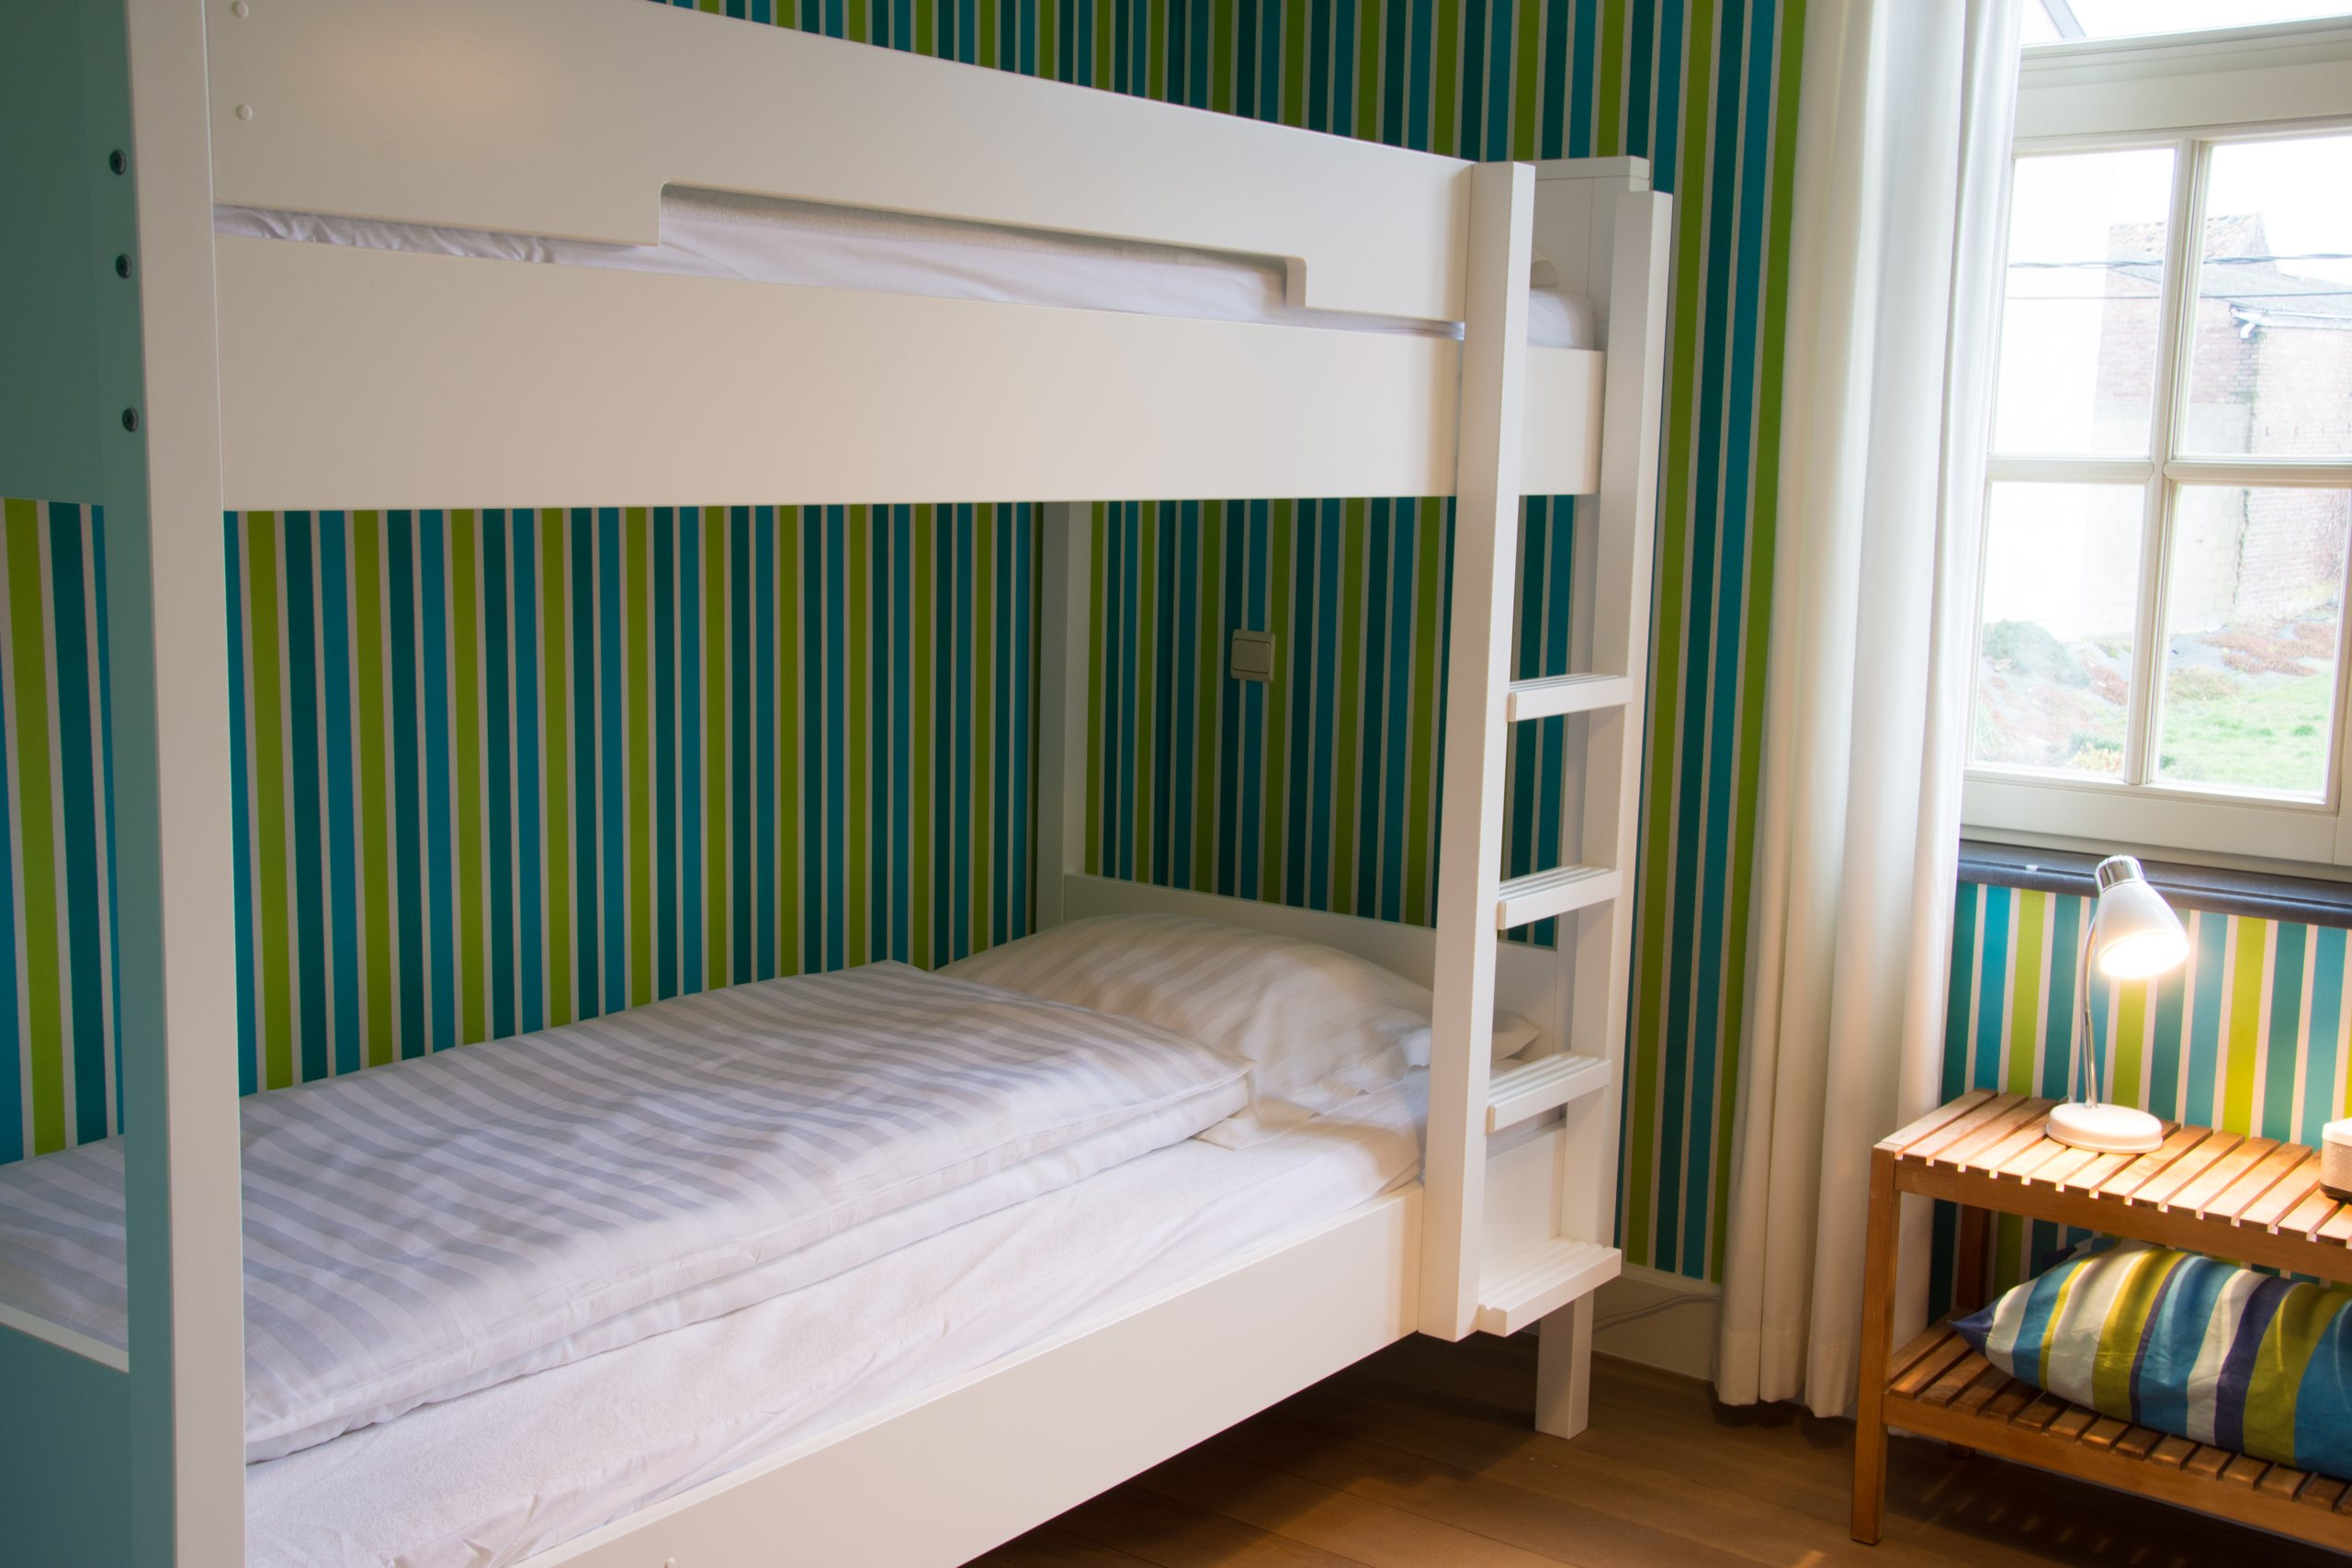 Hof der Heerlijckheid - slaapkamer 2 stapelbed